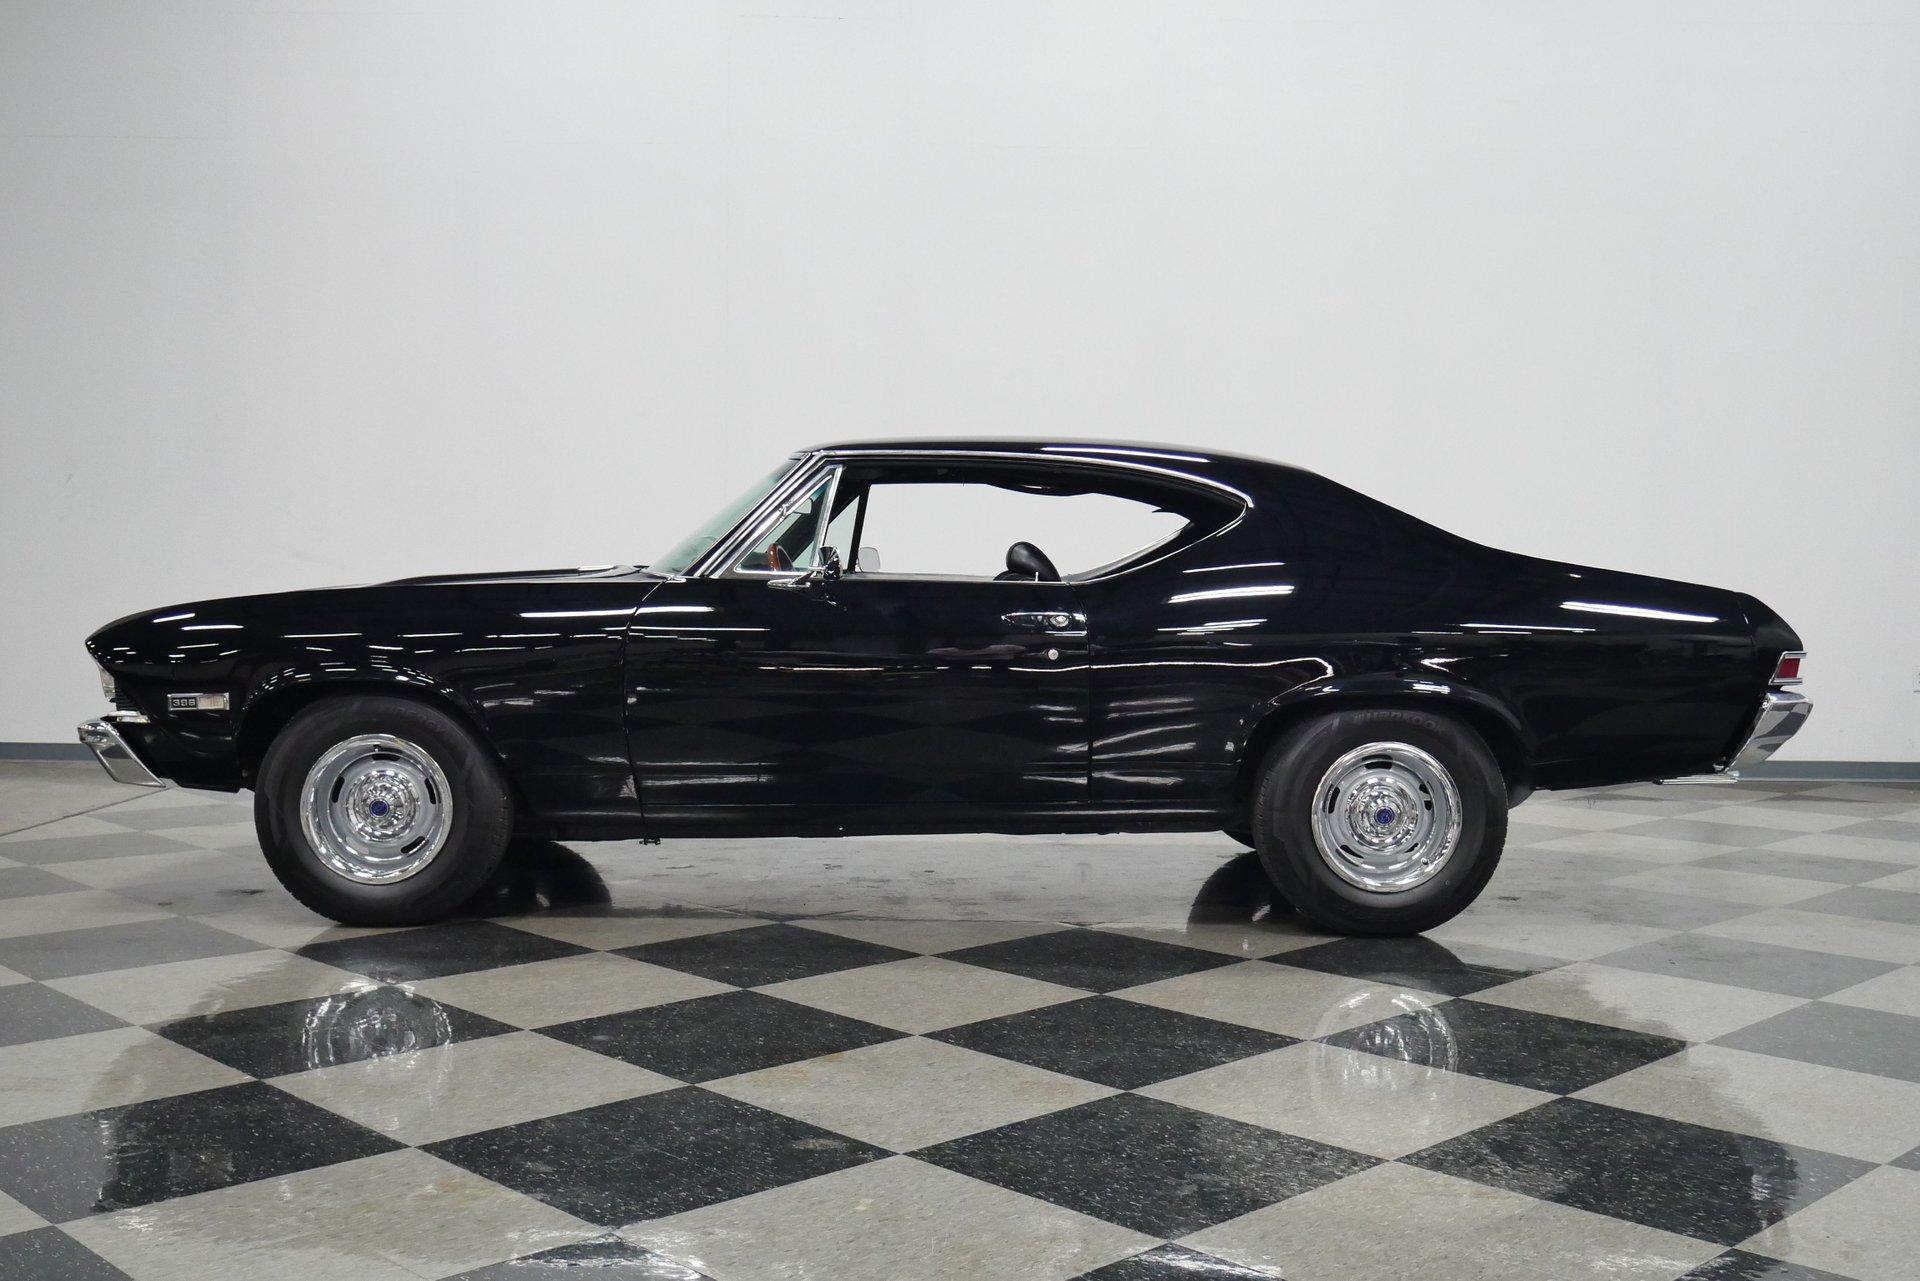 1968 chevrolet chevelle ss tribute